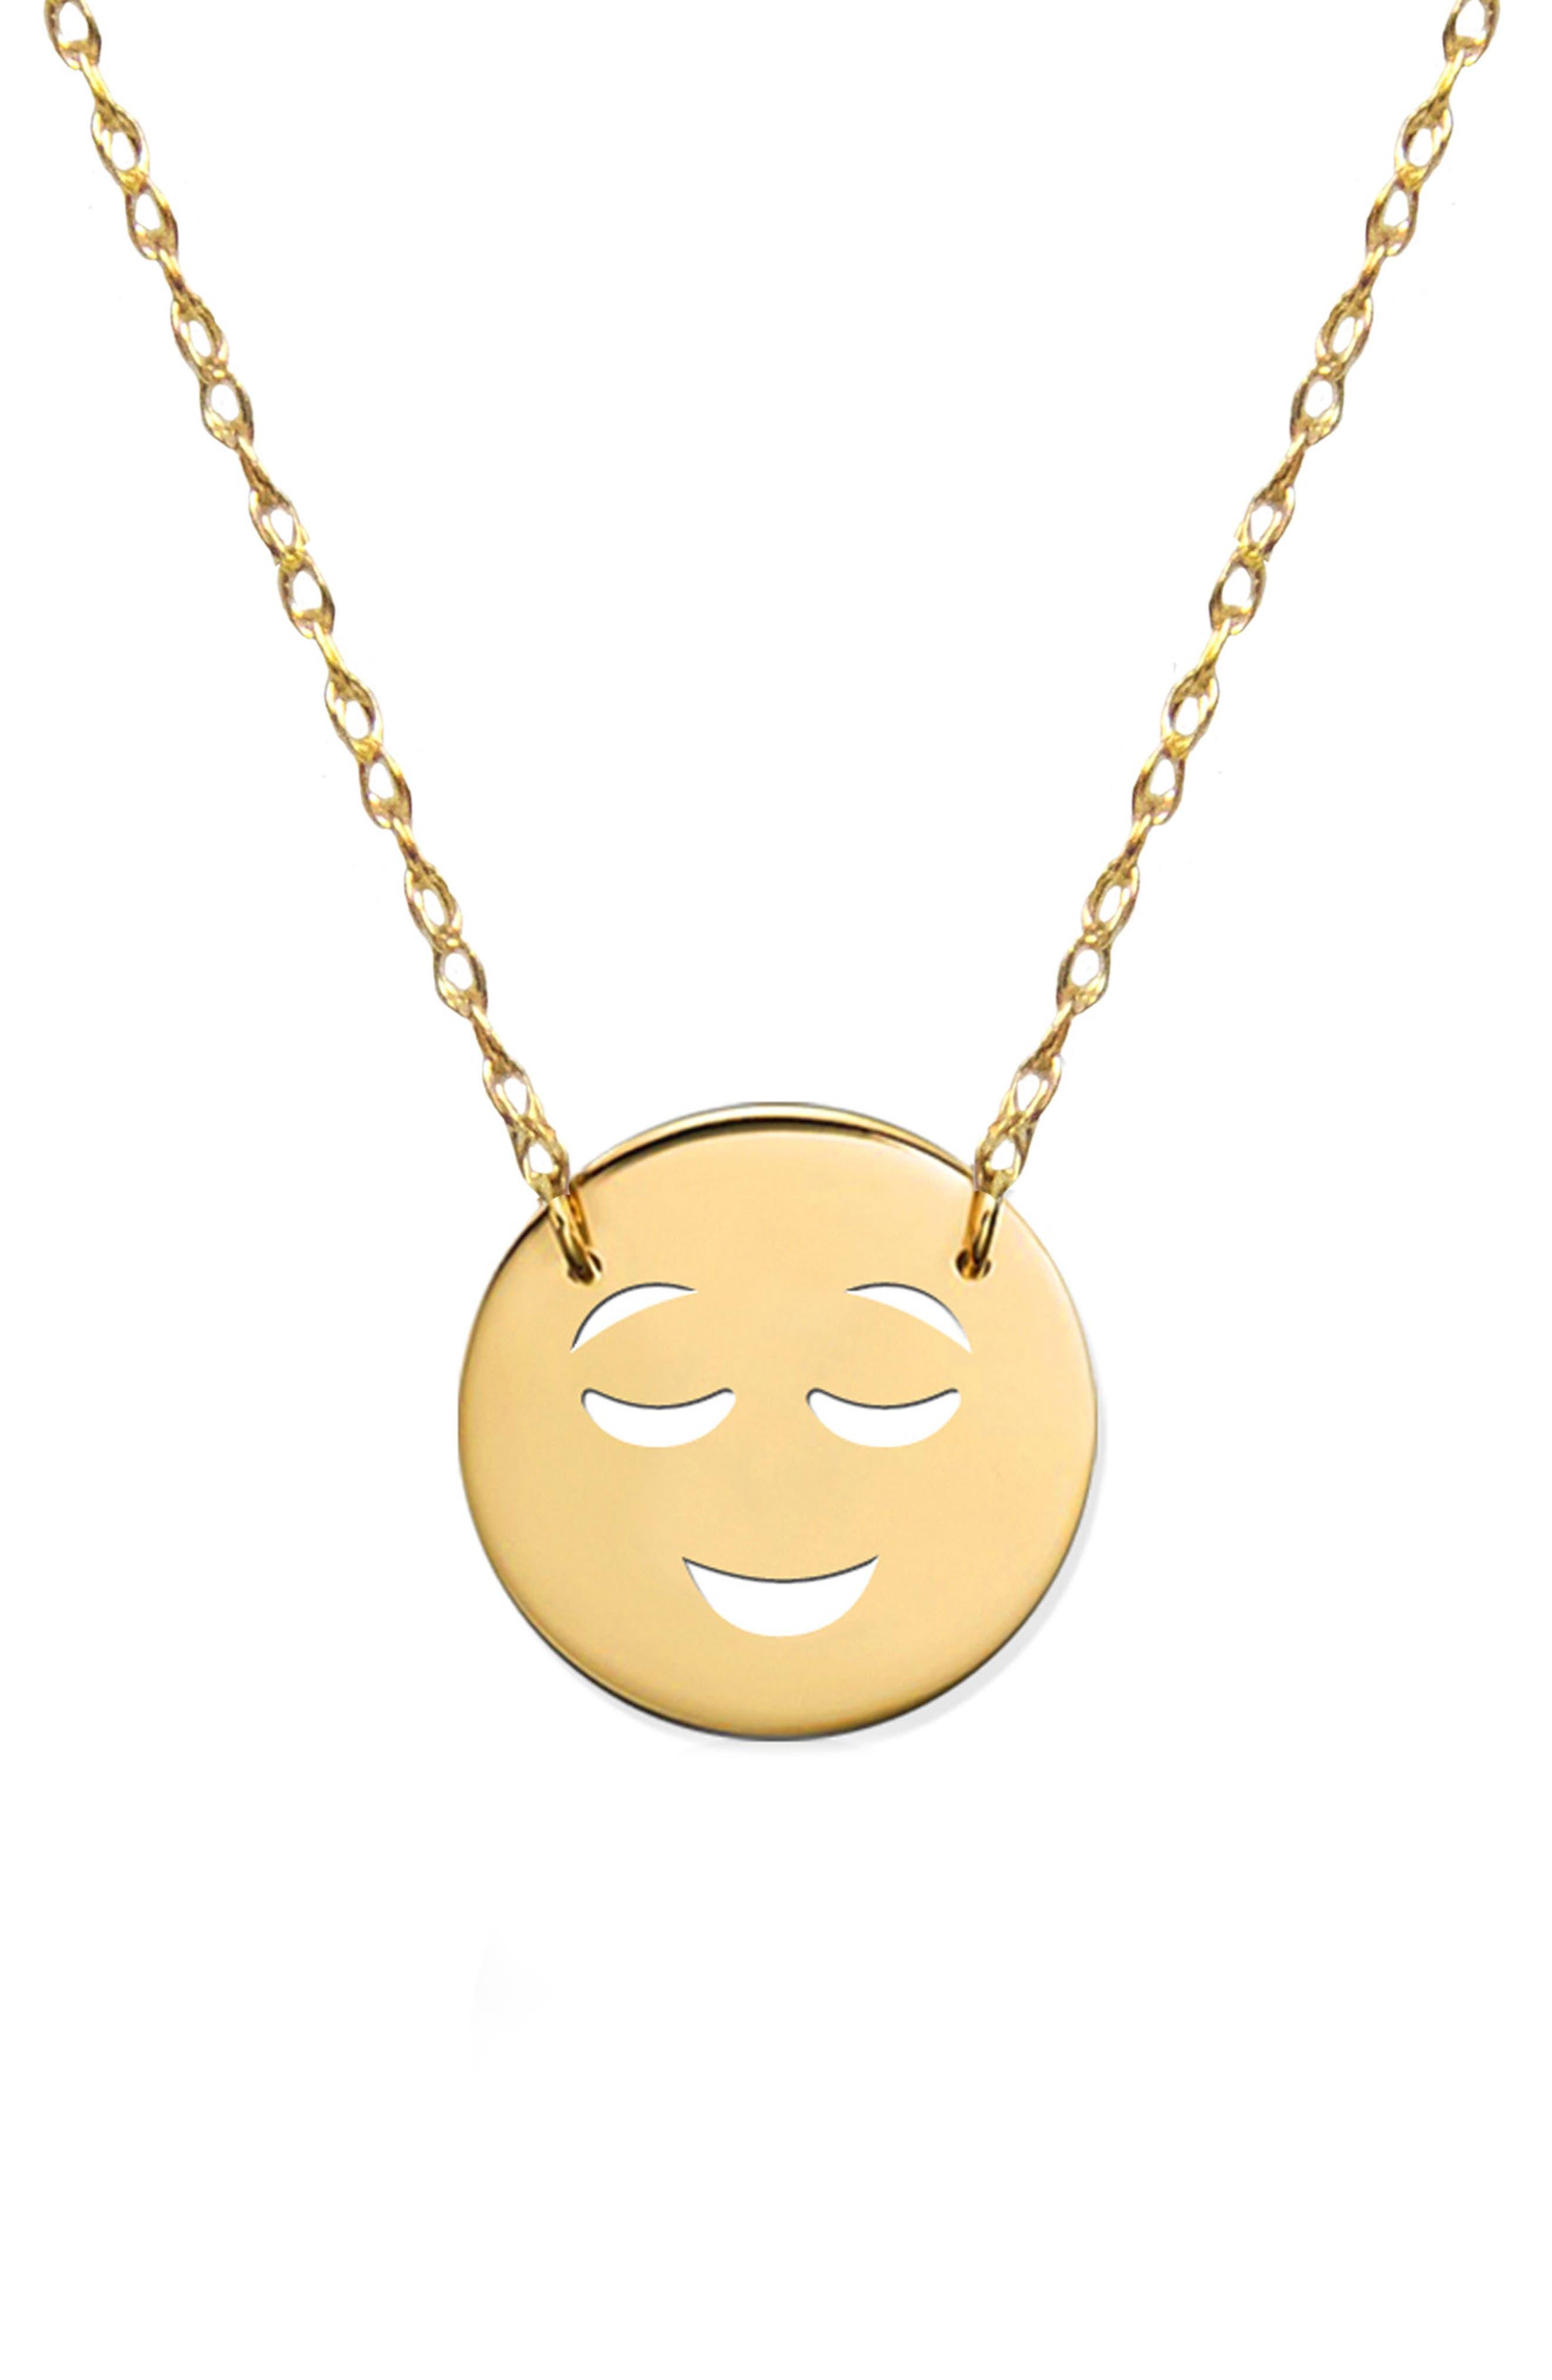 Happy Emoji Pendant Necklace,                             Main thumbnail 1, color,                             710